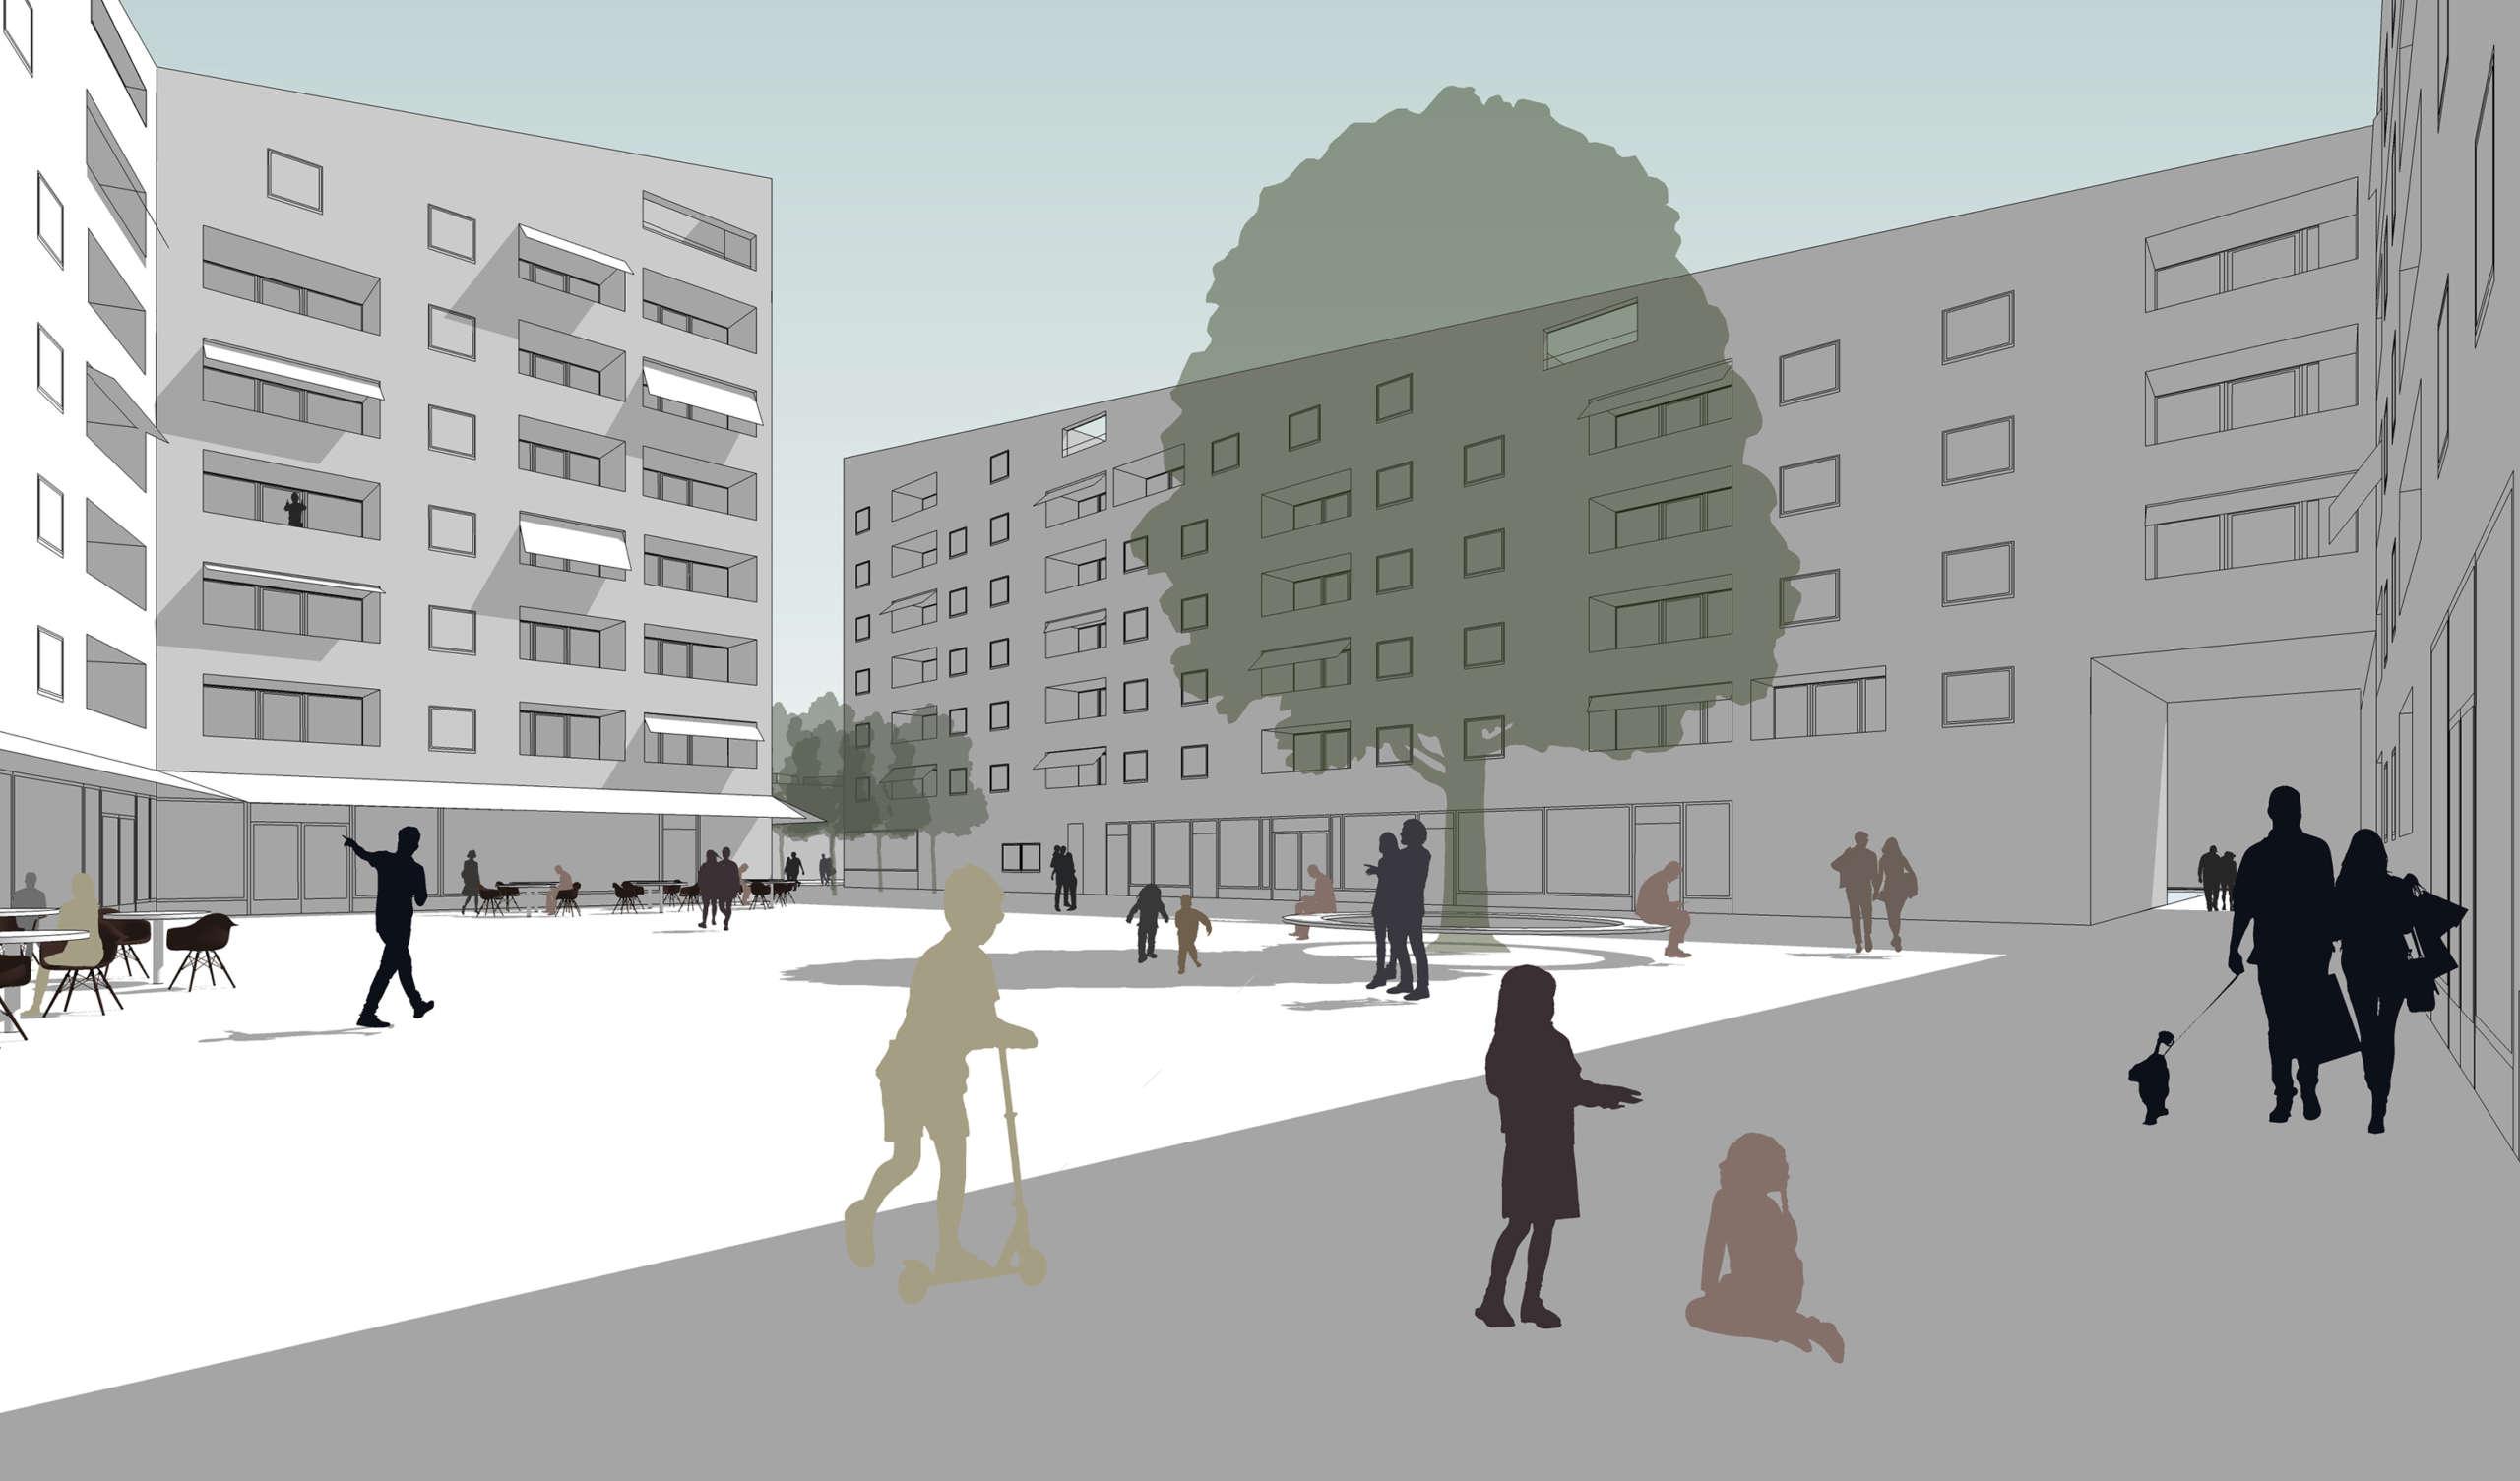 Wohnquartier Am Buergerhaus Mainz Kostheim Visualisierung Lead Image Beschnitten